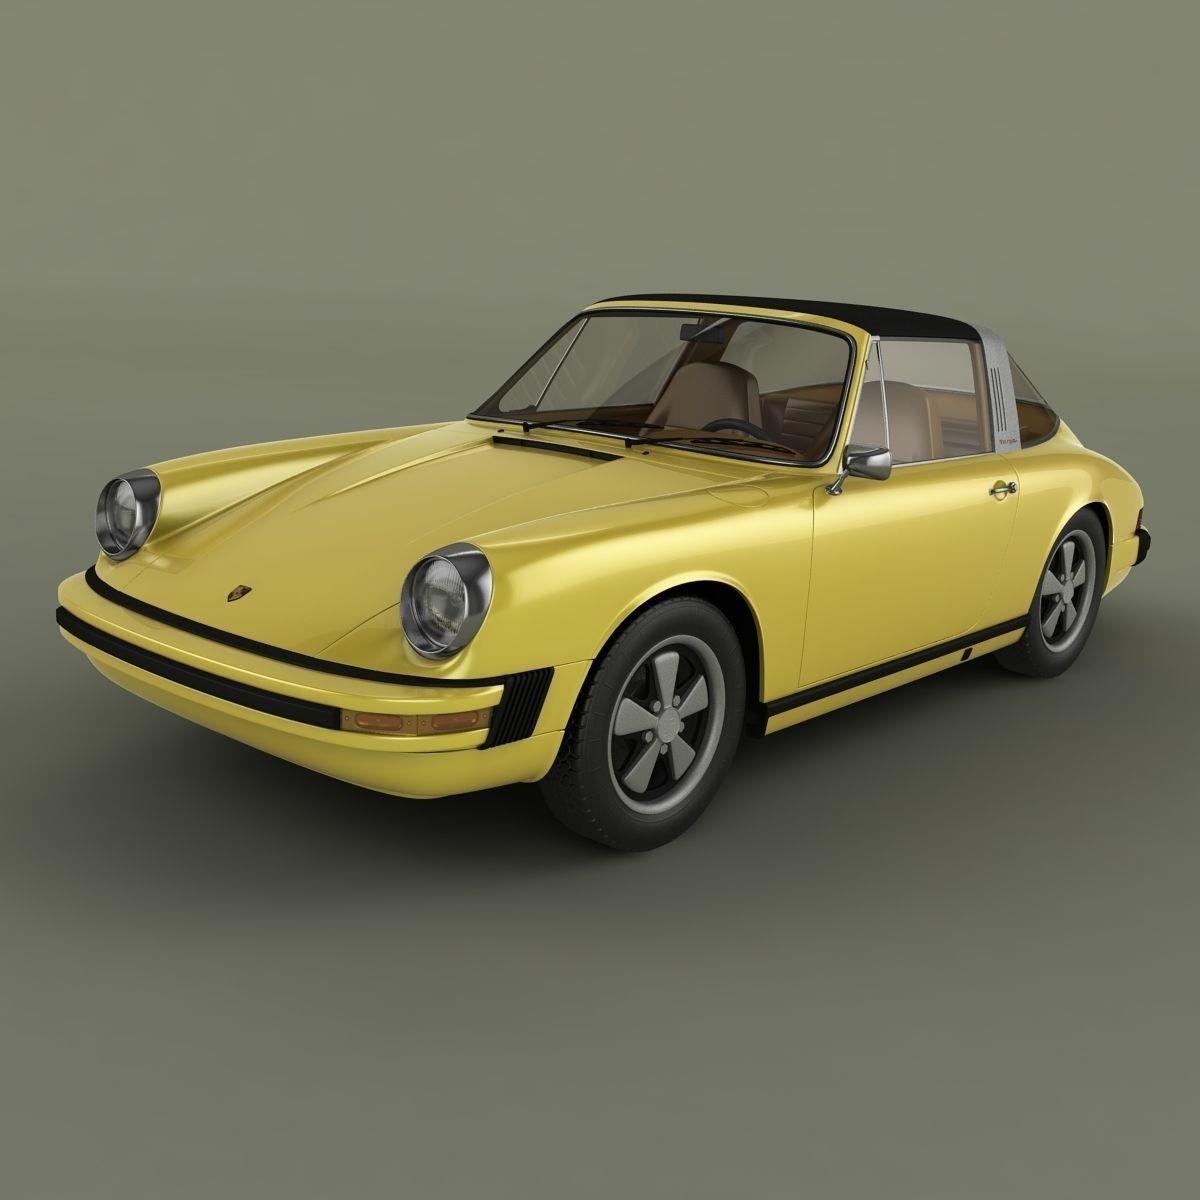 porsche 911 targa 1974 3d model max obj 3ds. Black Bedroom Furniture Sets. Home Design Ideas